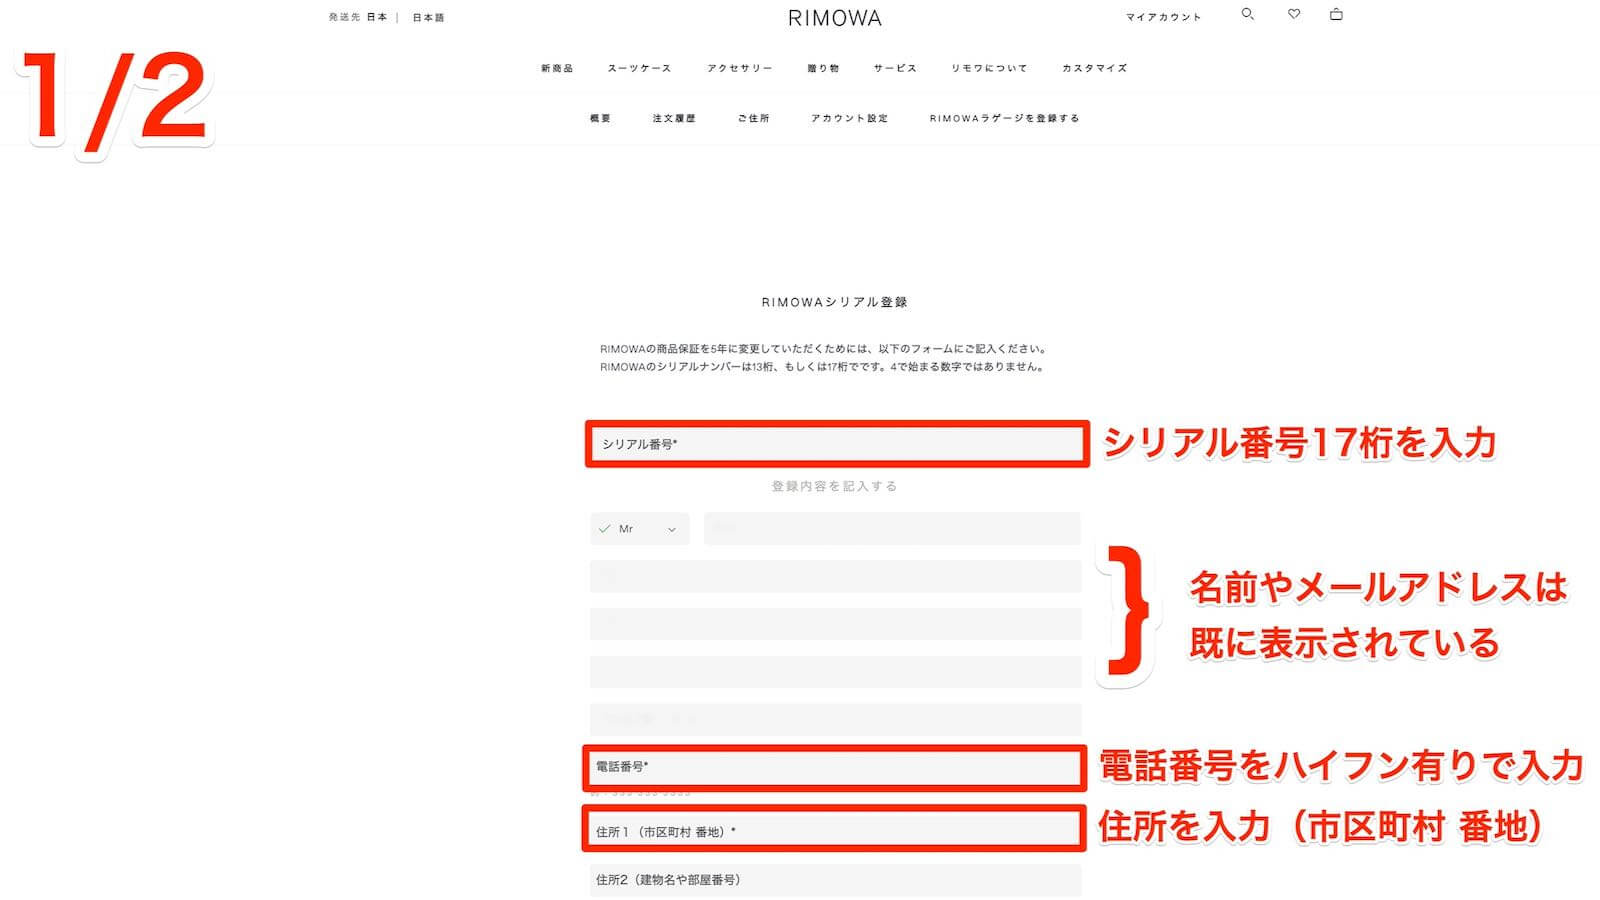 0229 Rimowa online registration method 11